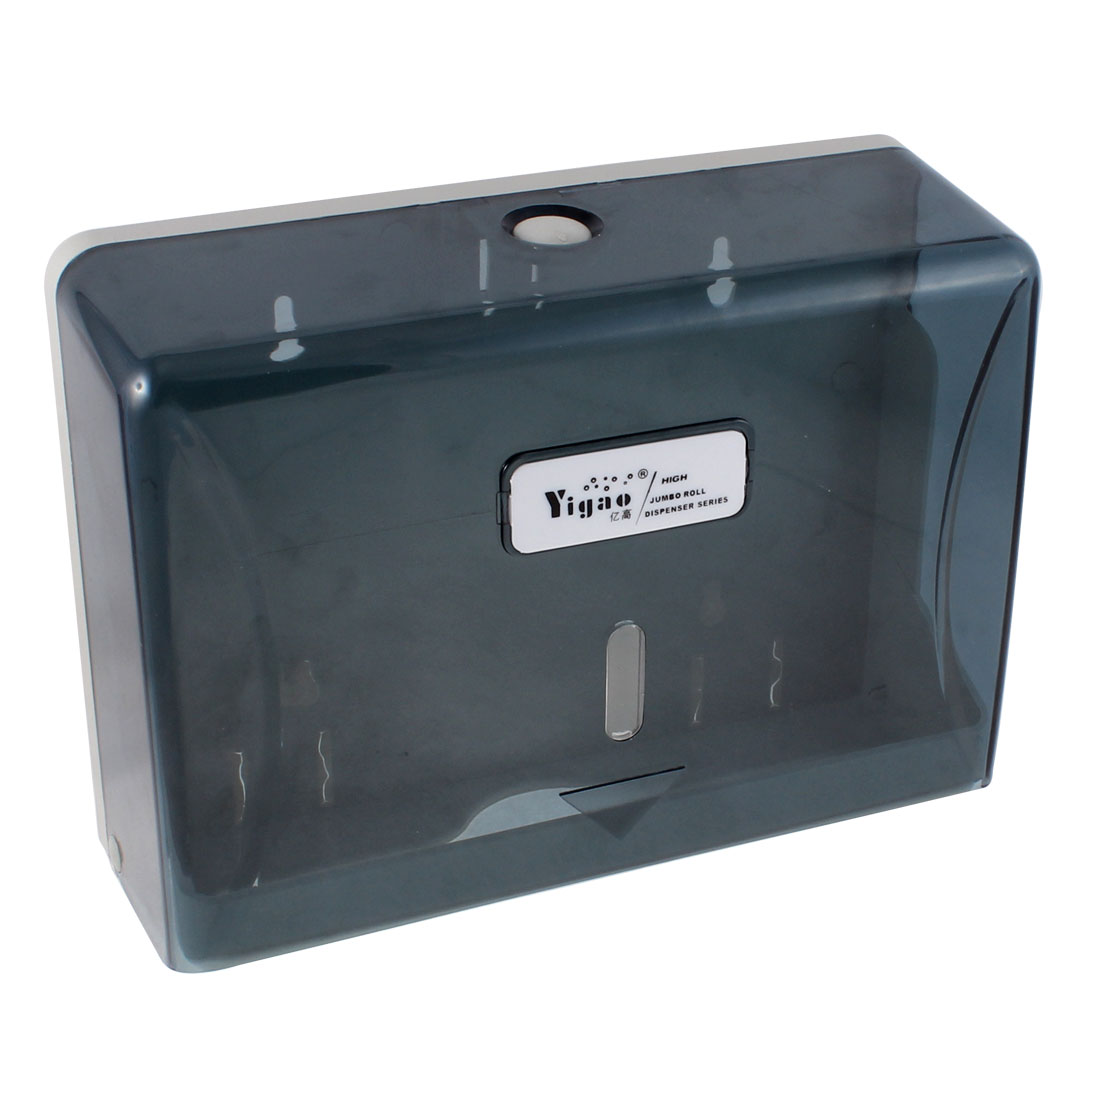 Hotel Bathroom Wall-hanging Type Toilet Paper Tissue Holder Case Dispenser Translucent